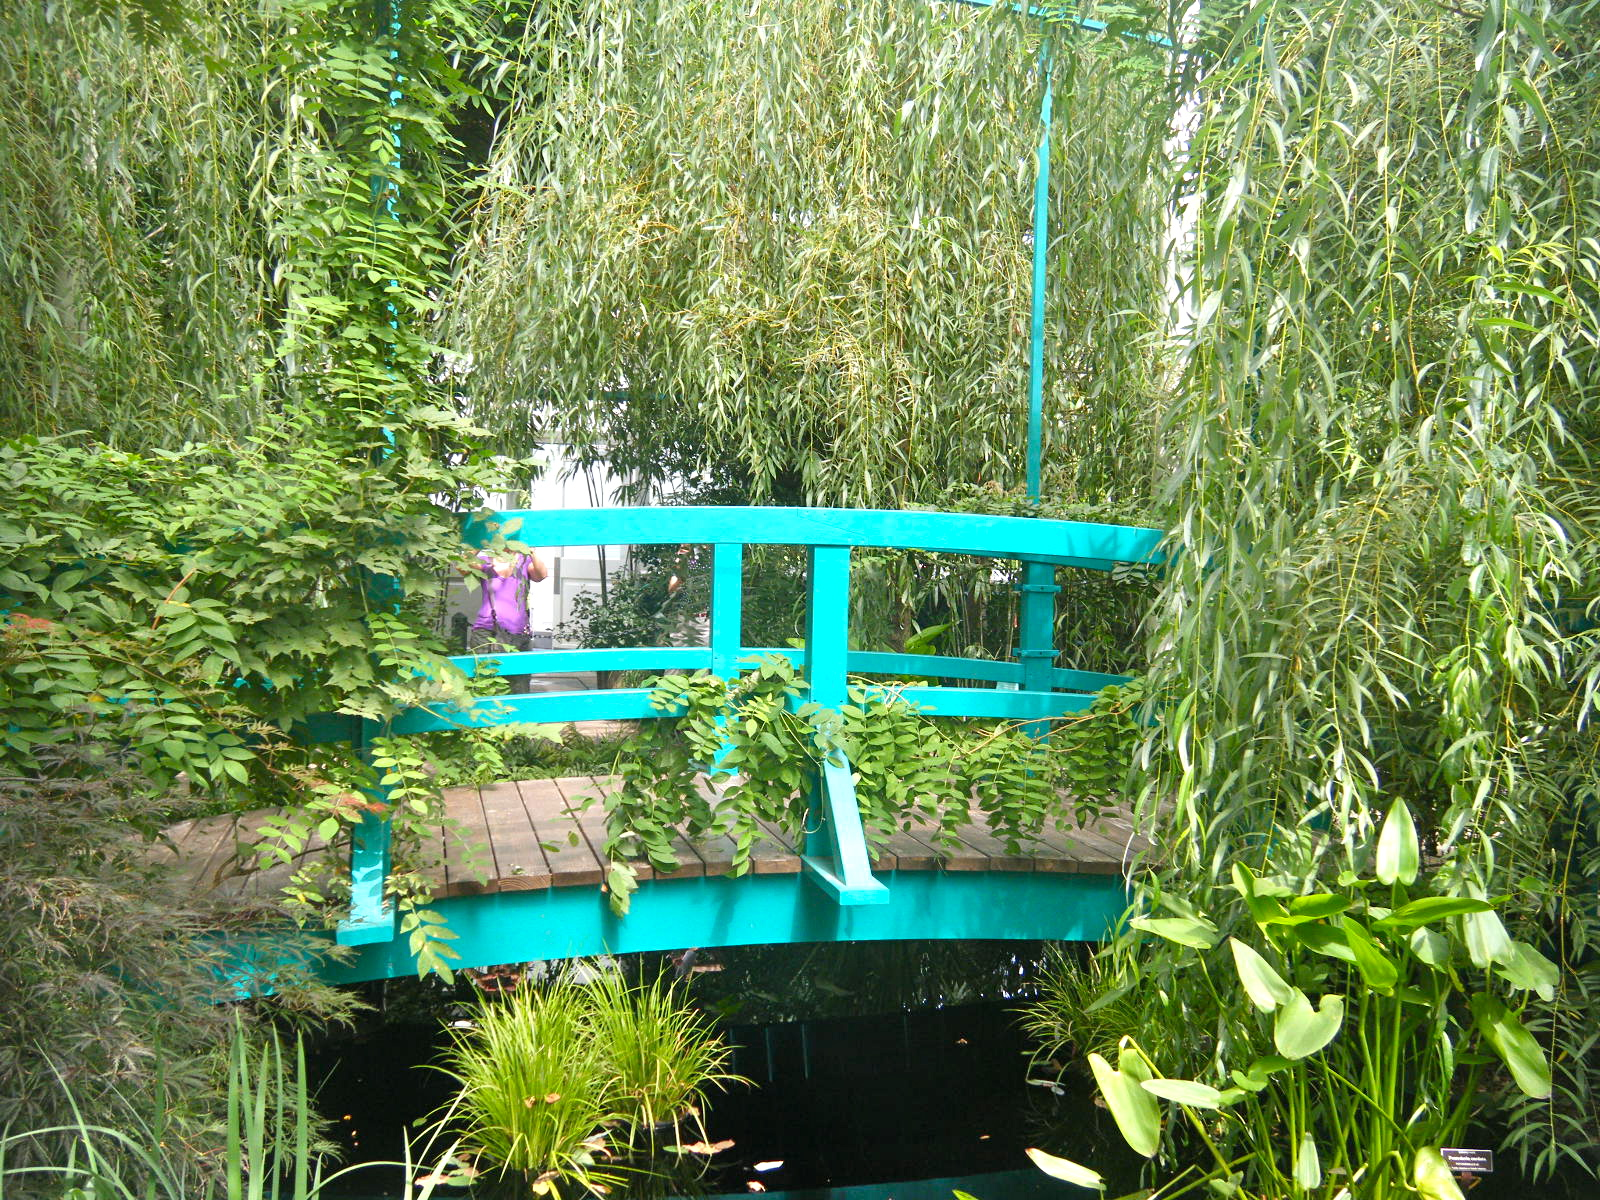 DSCF3478 - Monet's Lily Pond, NYC Style